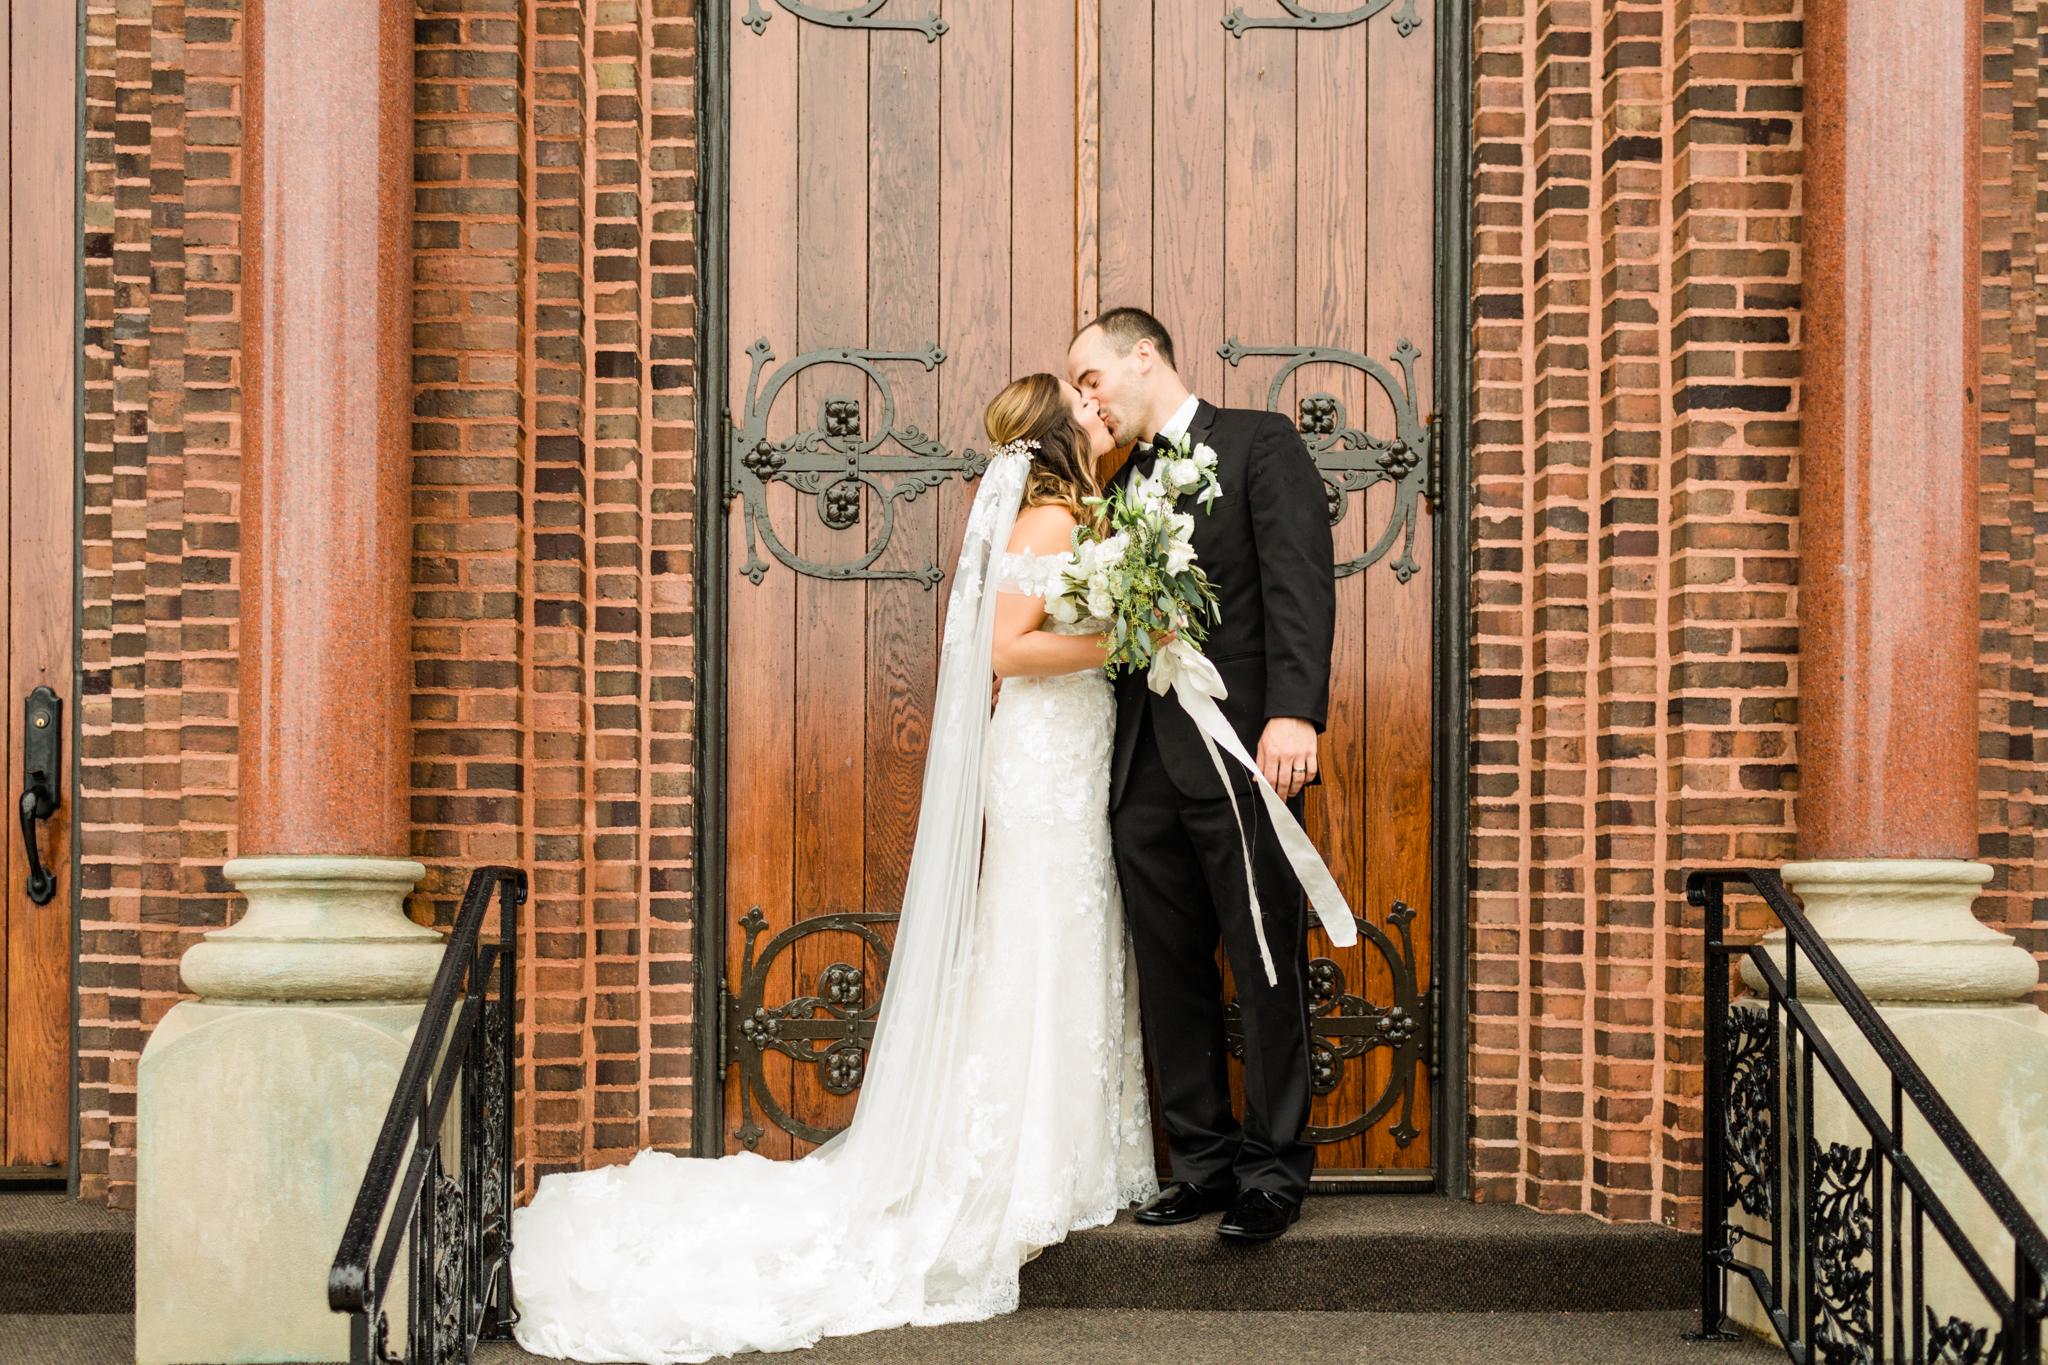 26-Katrina-Kyle-Jefferson-Inn-Wisconsin-Bride-James-Stokes-Photography.jpg